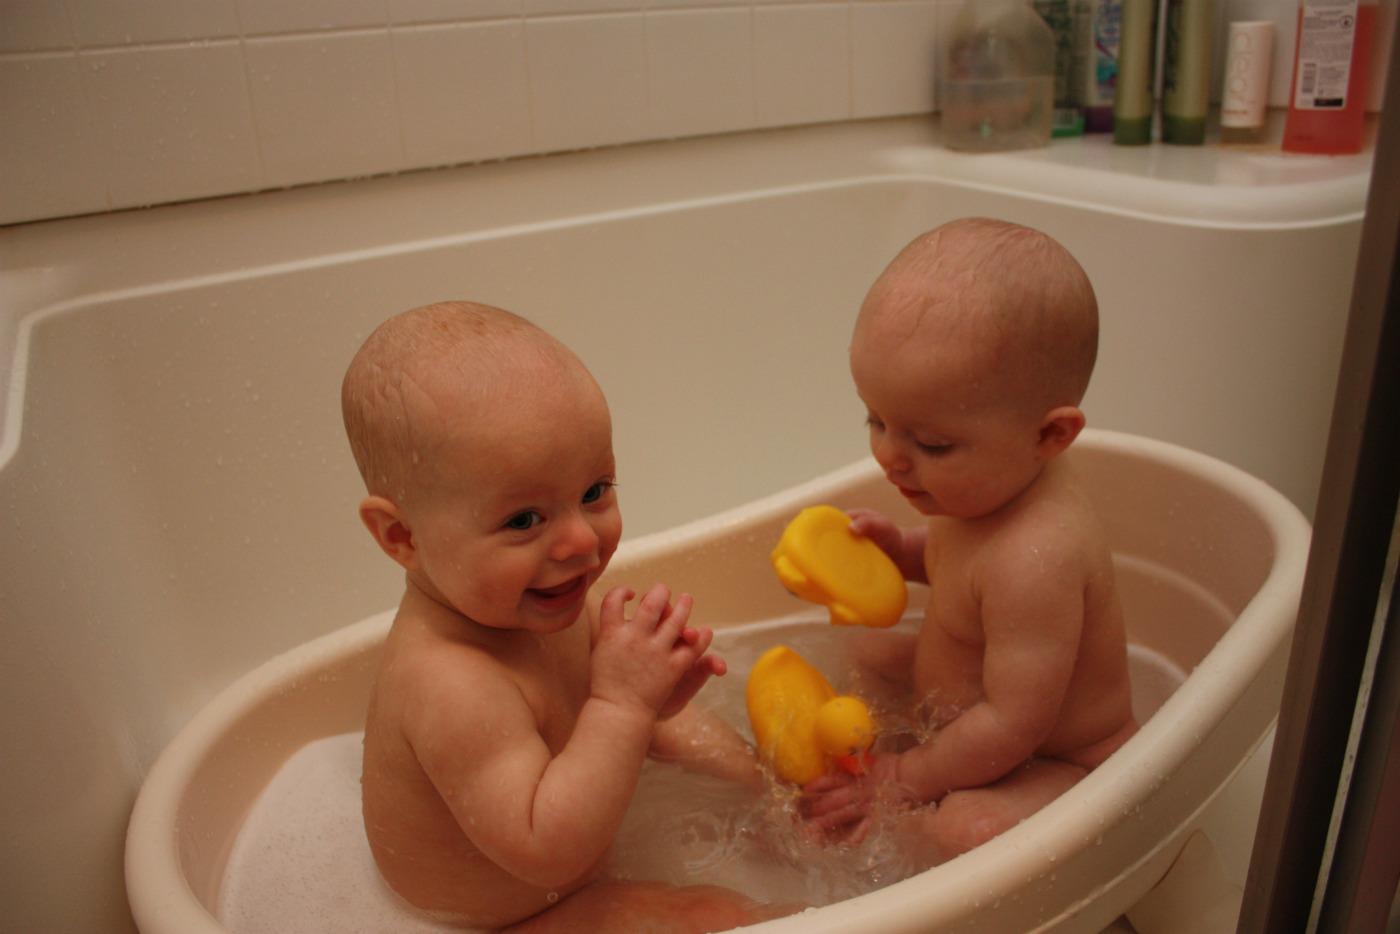 Outstanding Bathing Baby In Bathtub Illustration